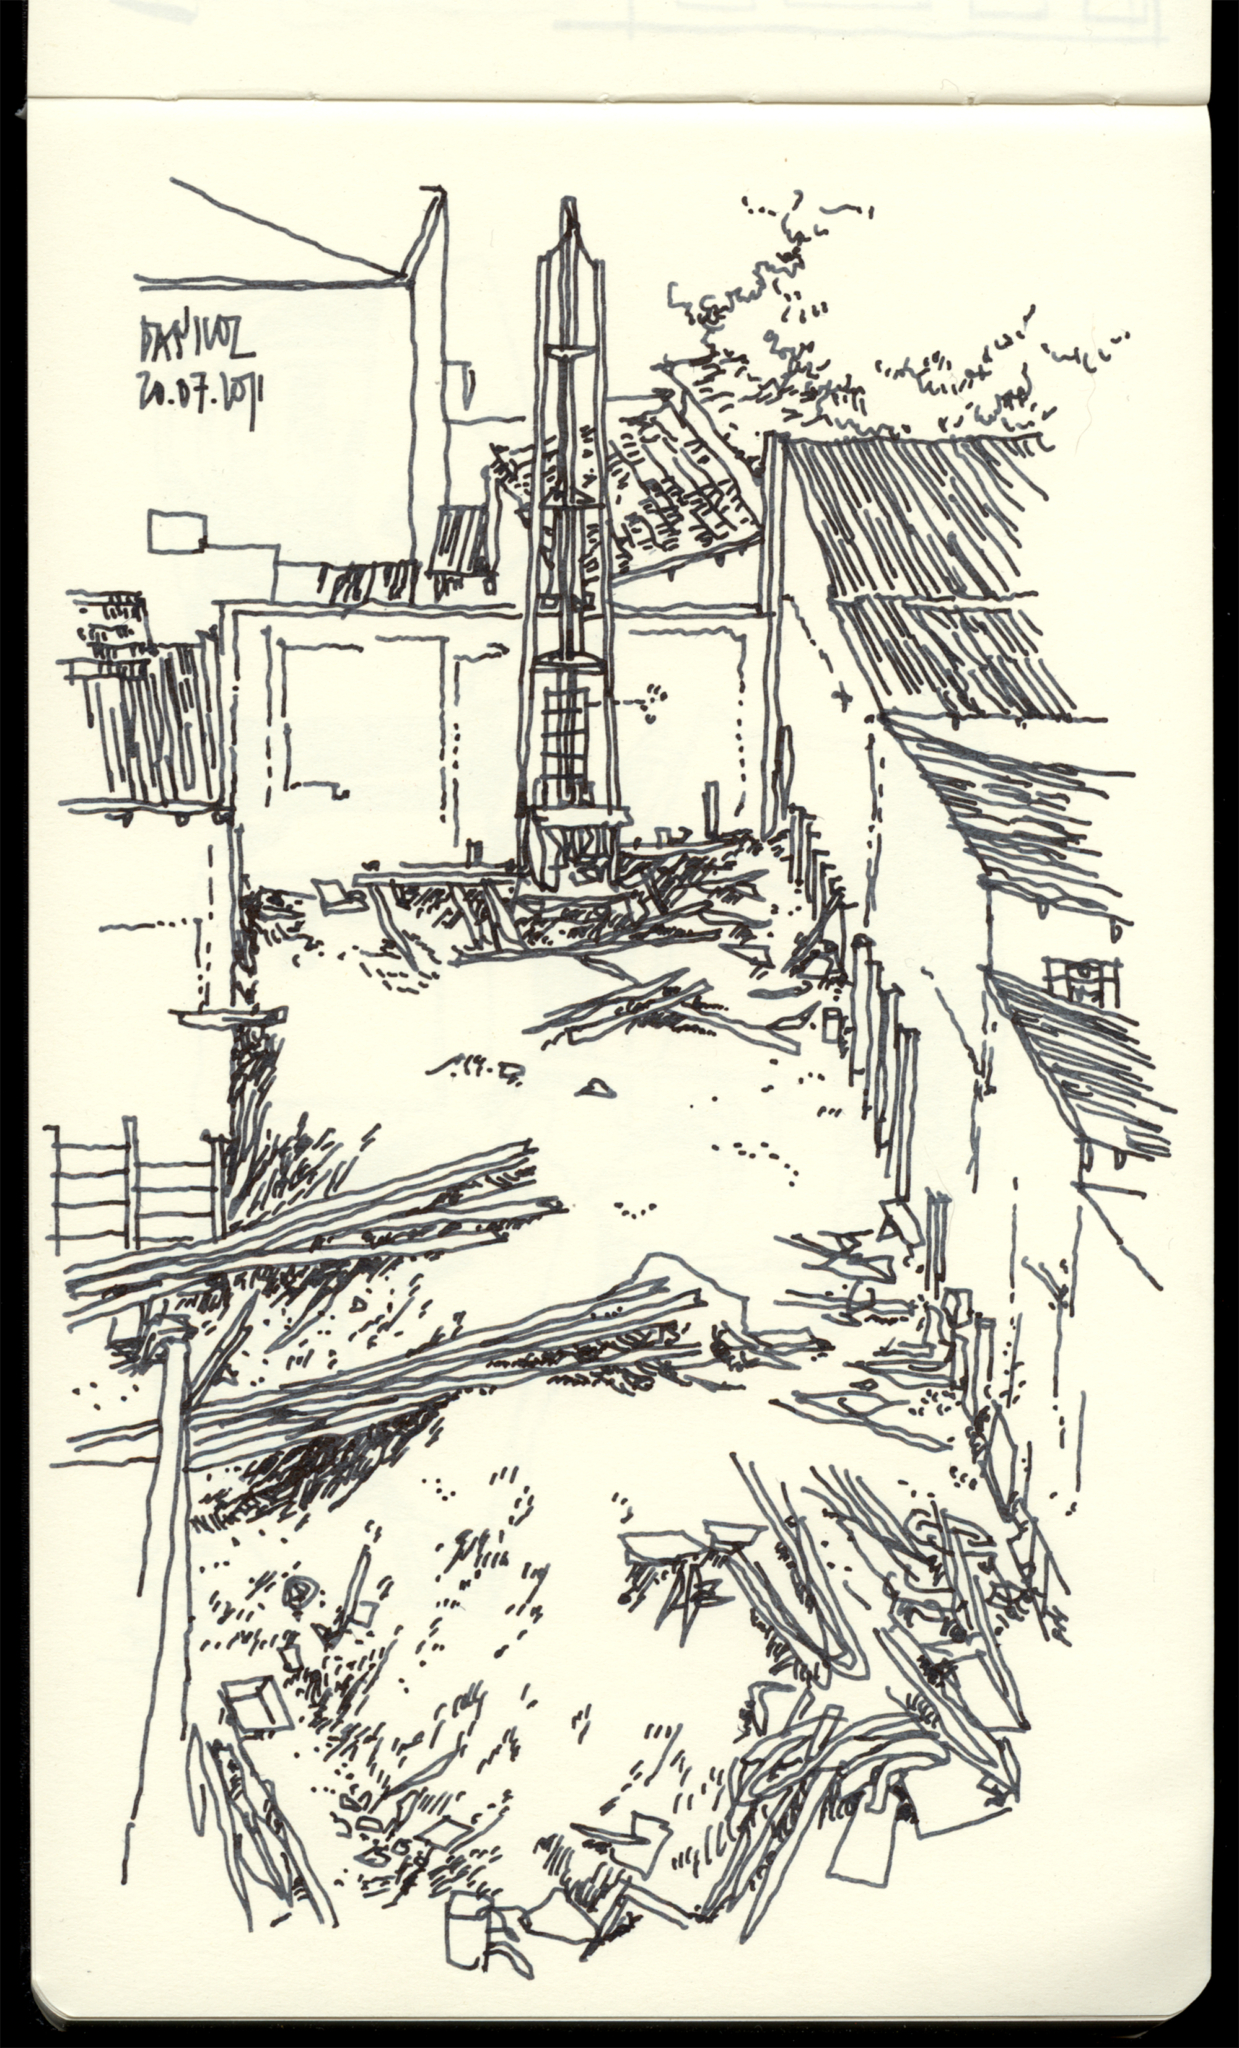 Demolição-Wisard-07-daniloz